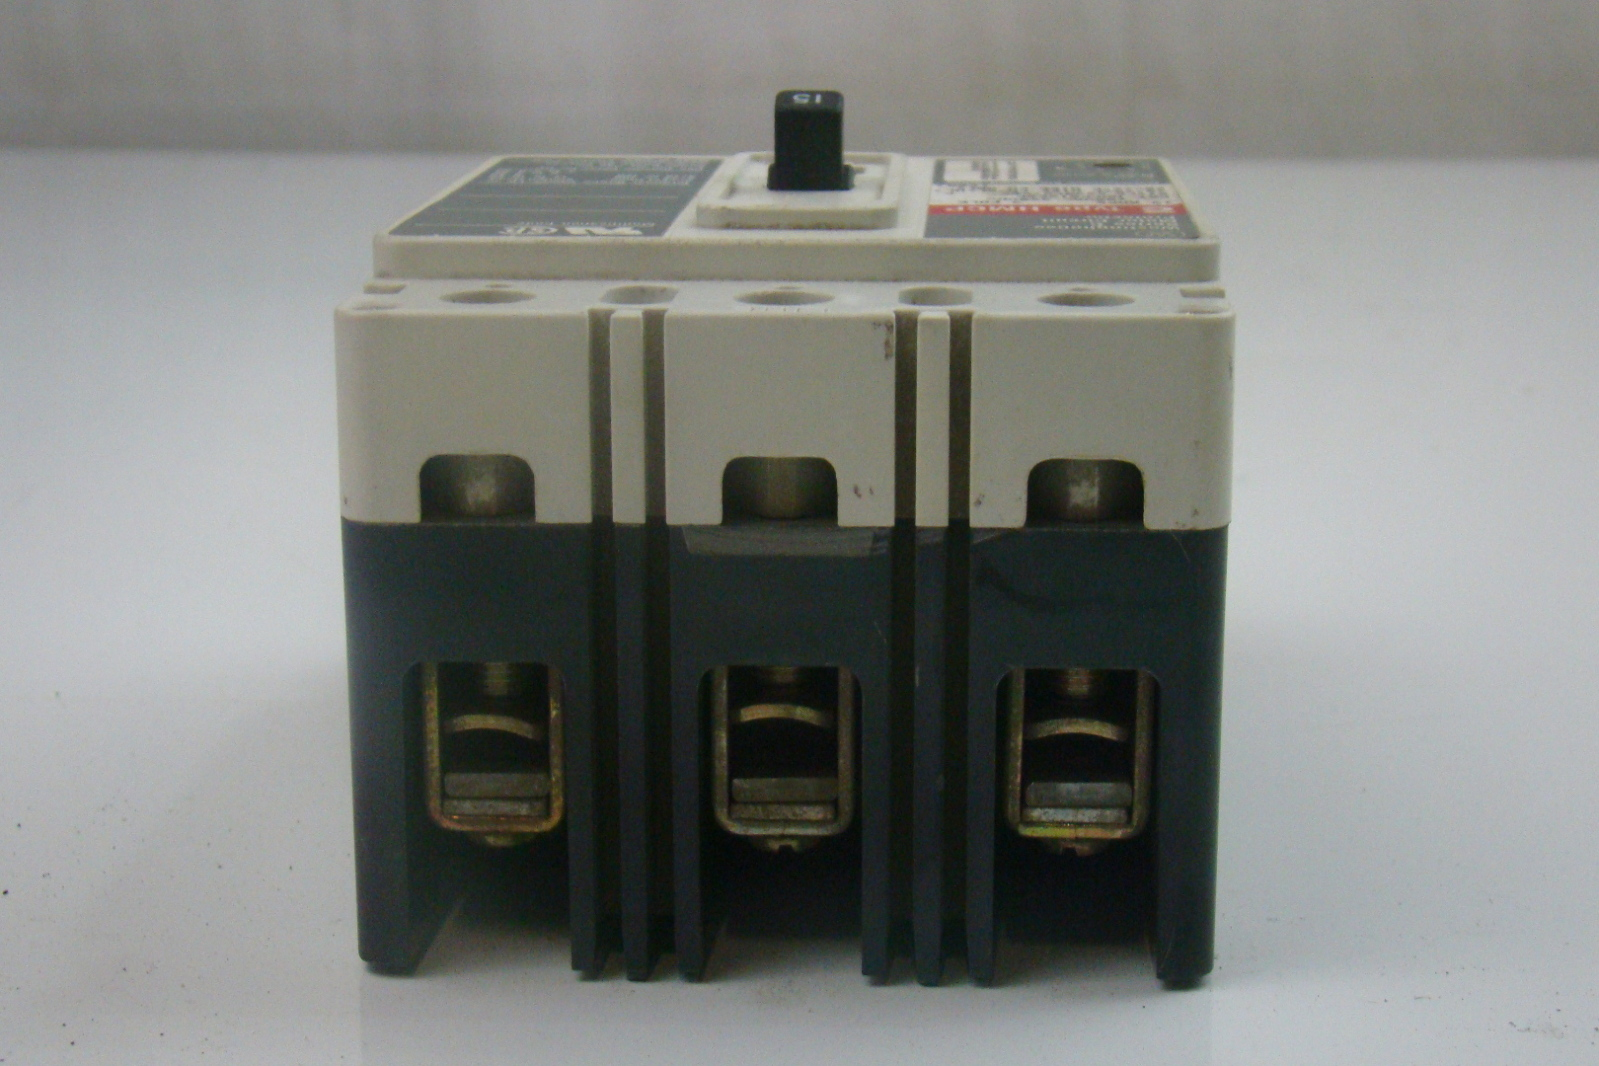 Westinghouse 15 Amp Series C Circuit Breaker Hmcp015e0c